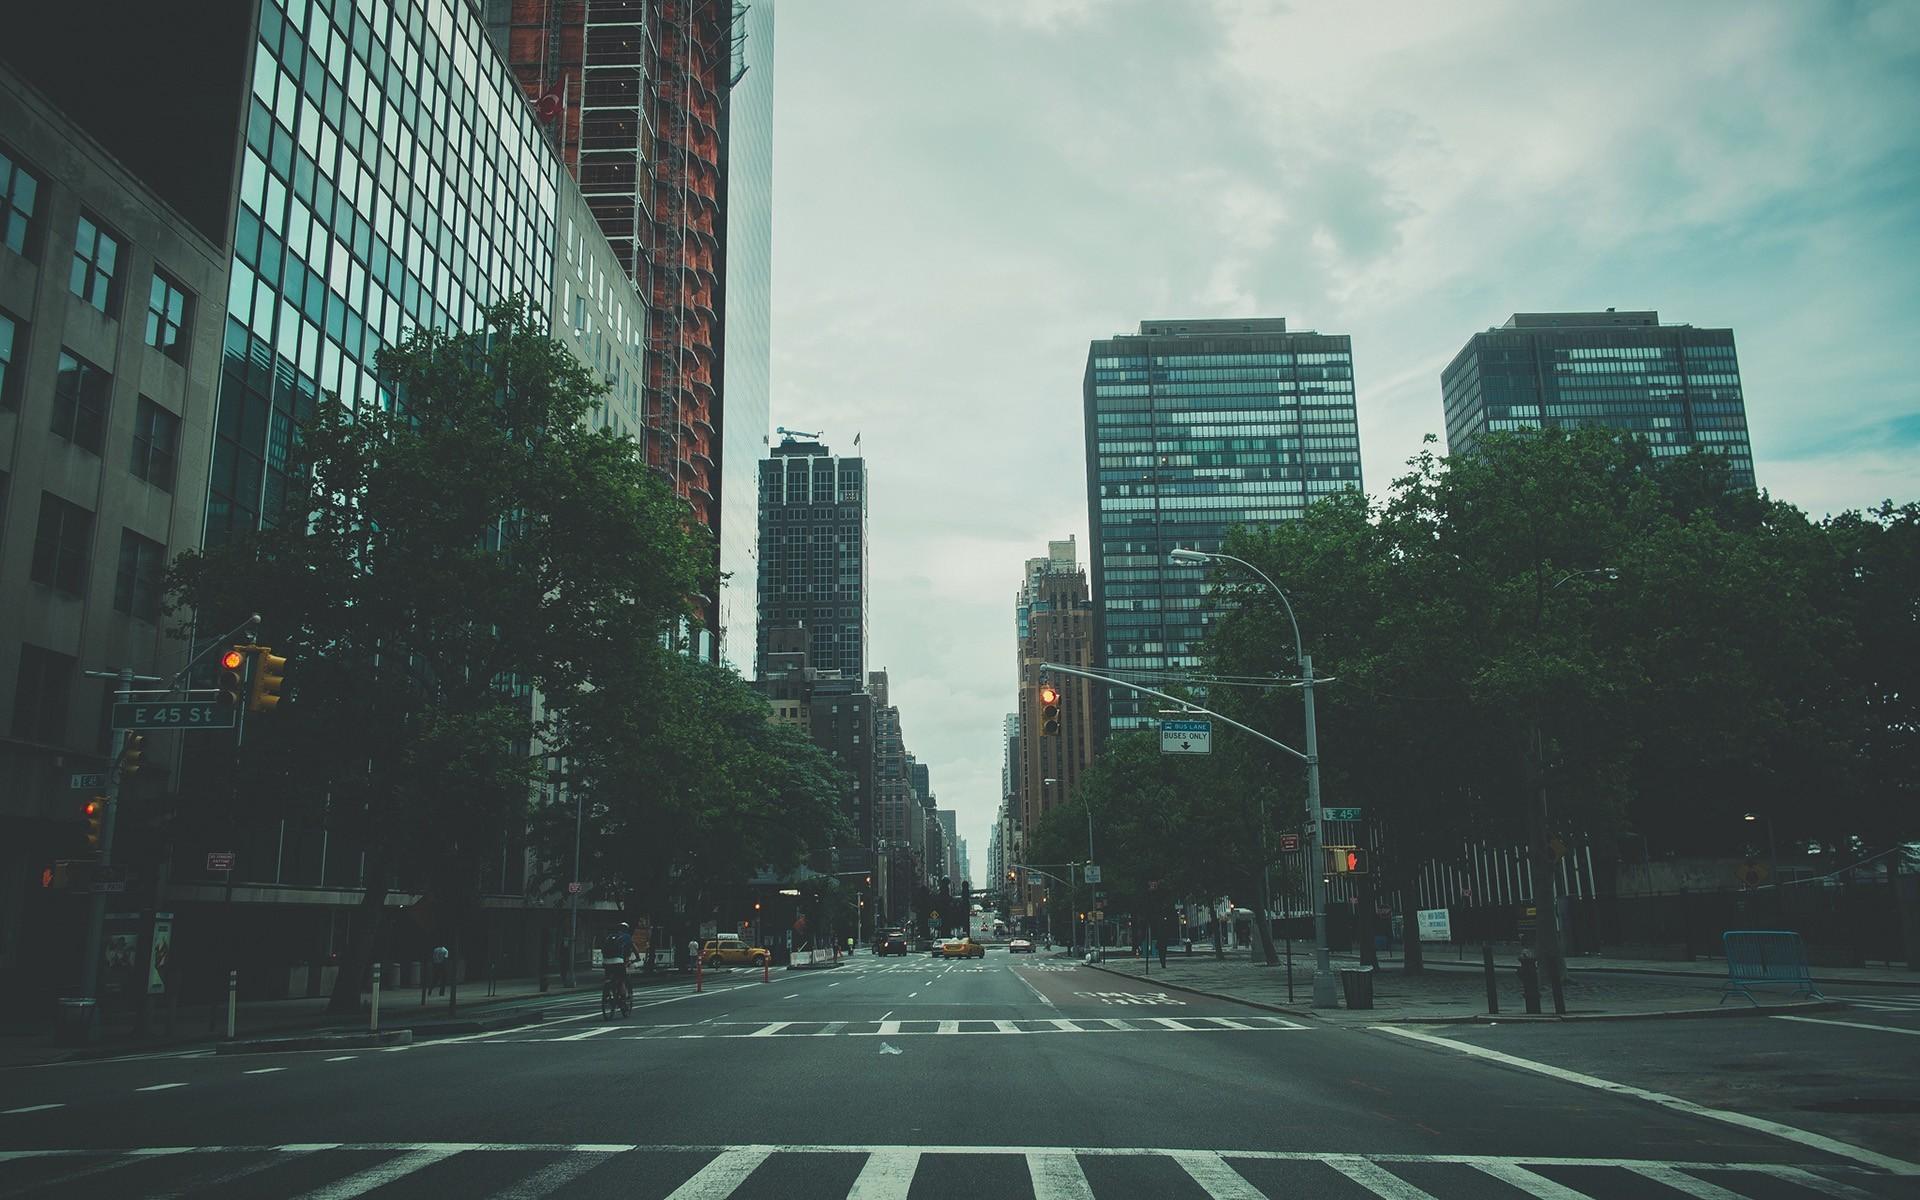 General 1920x1200 New York City cityscape USA street urban